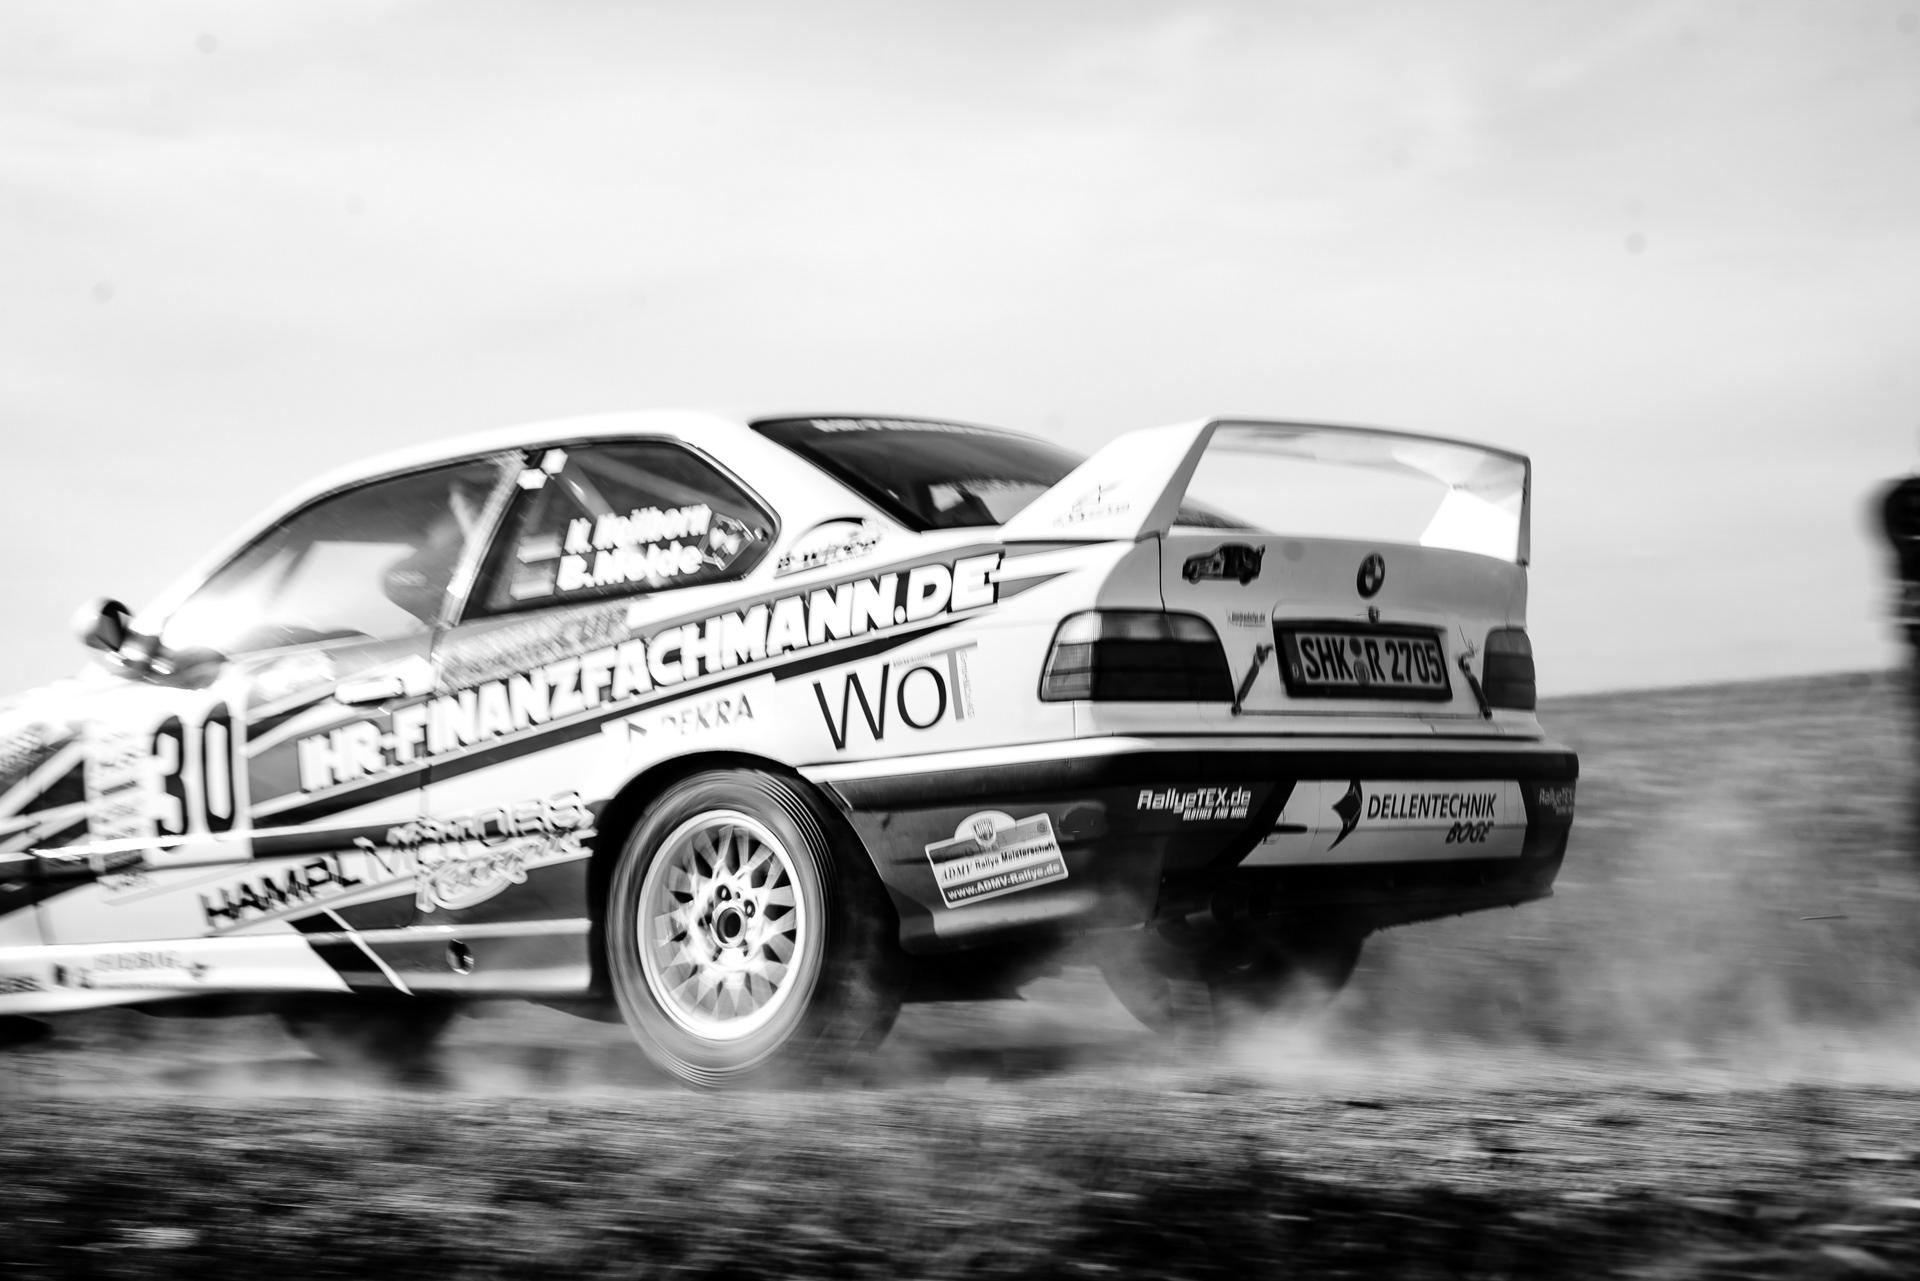 Rallye bad schmiedeberg 2020